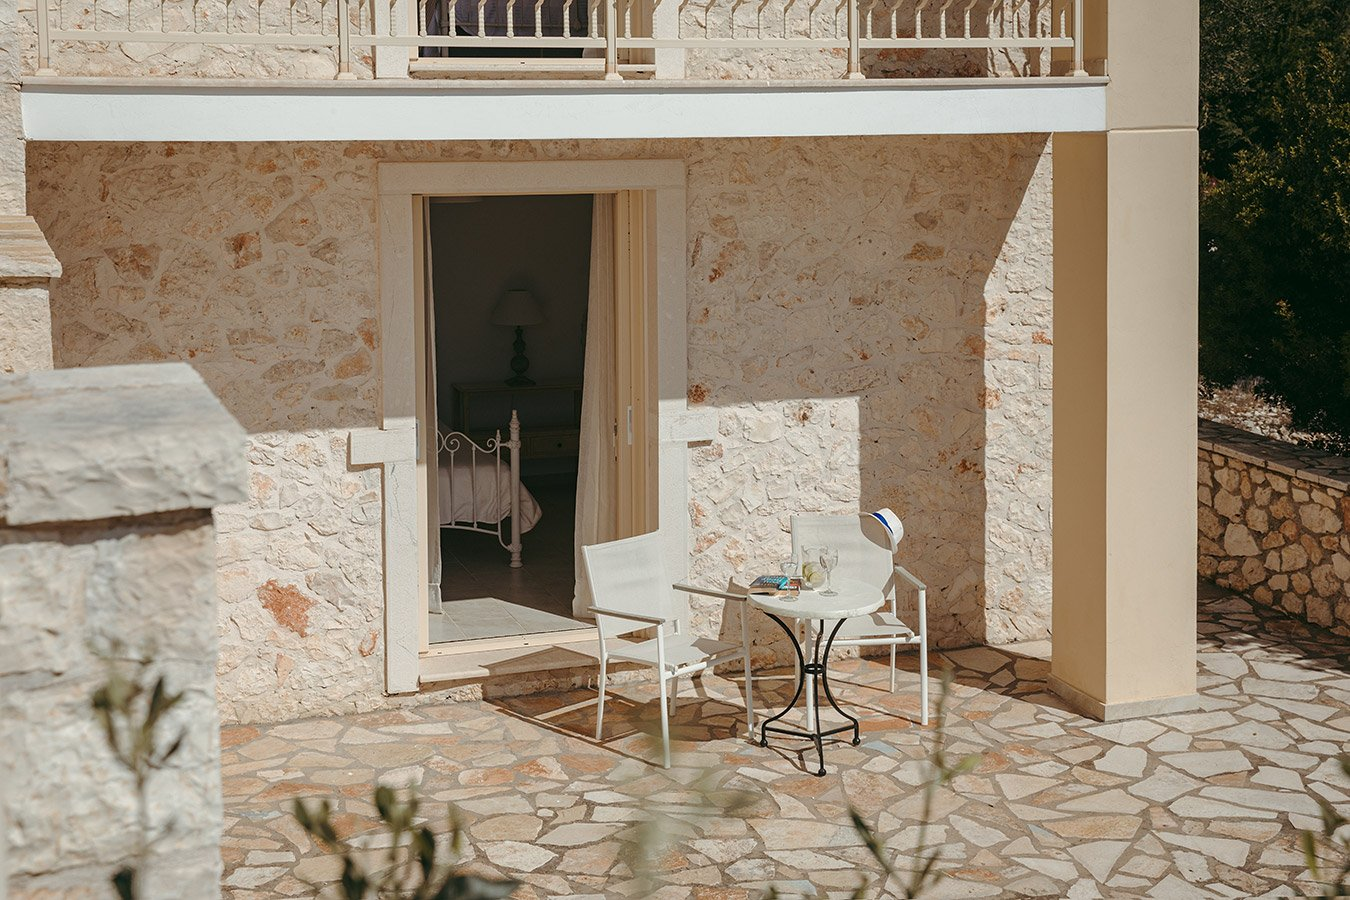 Kyparissi Villa Paxos Exterior